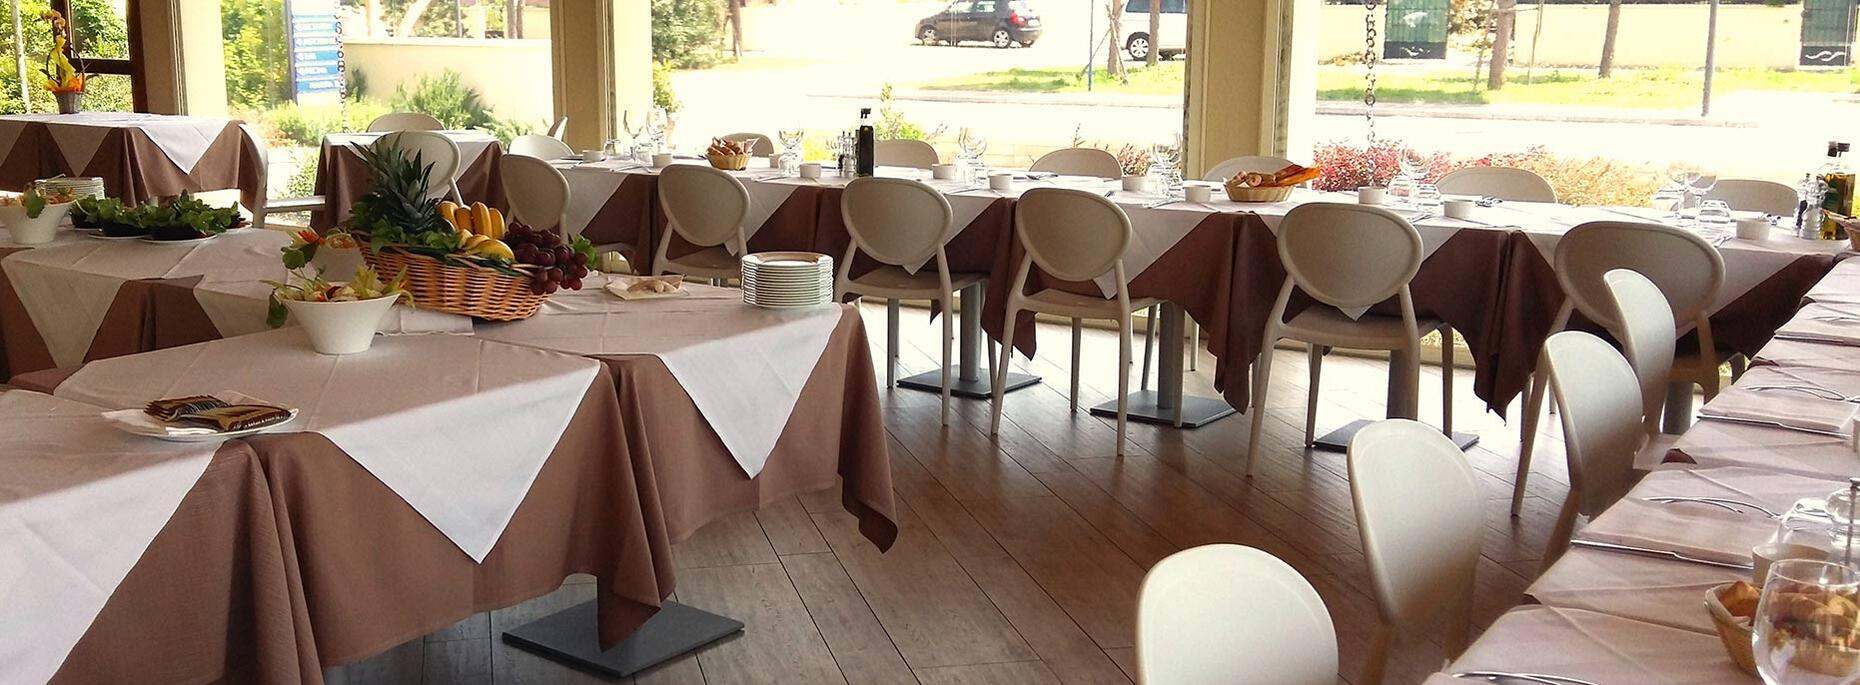 aironebiancoresidencevillage en village-with-restaurant-lidi-comacchio 004